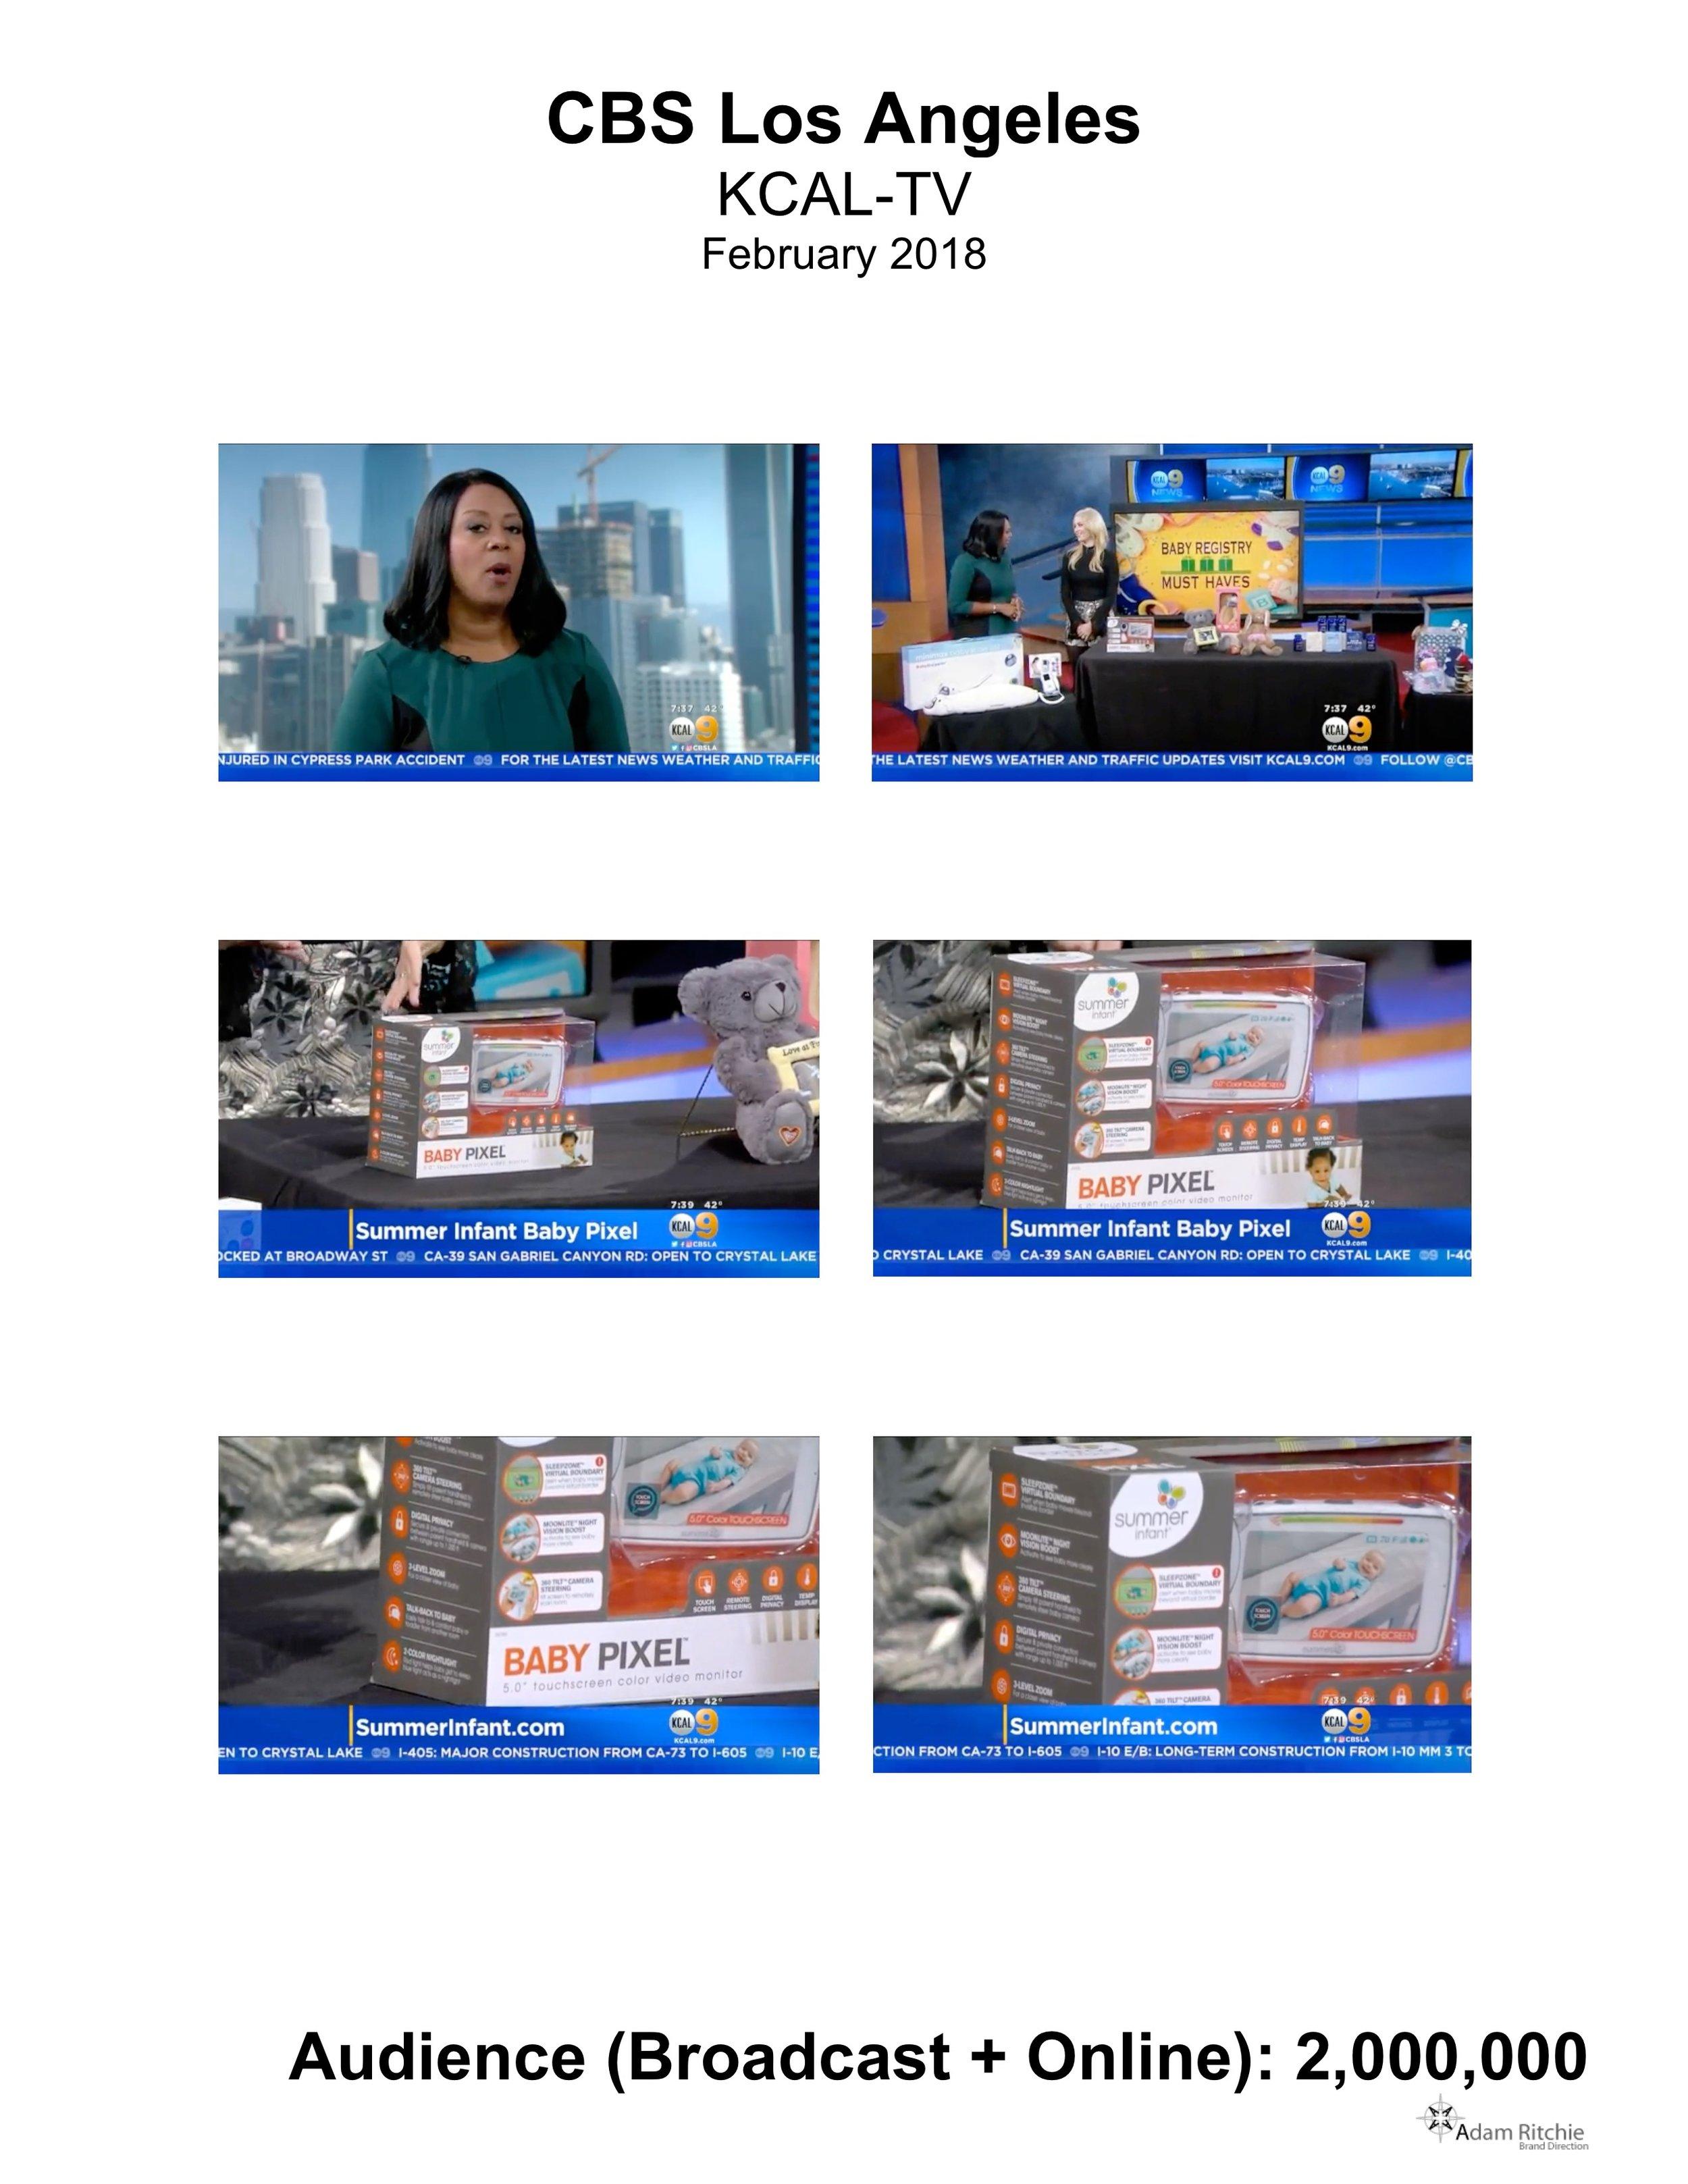 2018.02.24_KCAL-TV (CBS 9)_Summer Infant Baby Pixel Monitor.jpeg